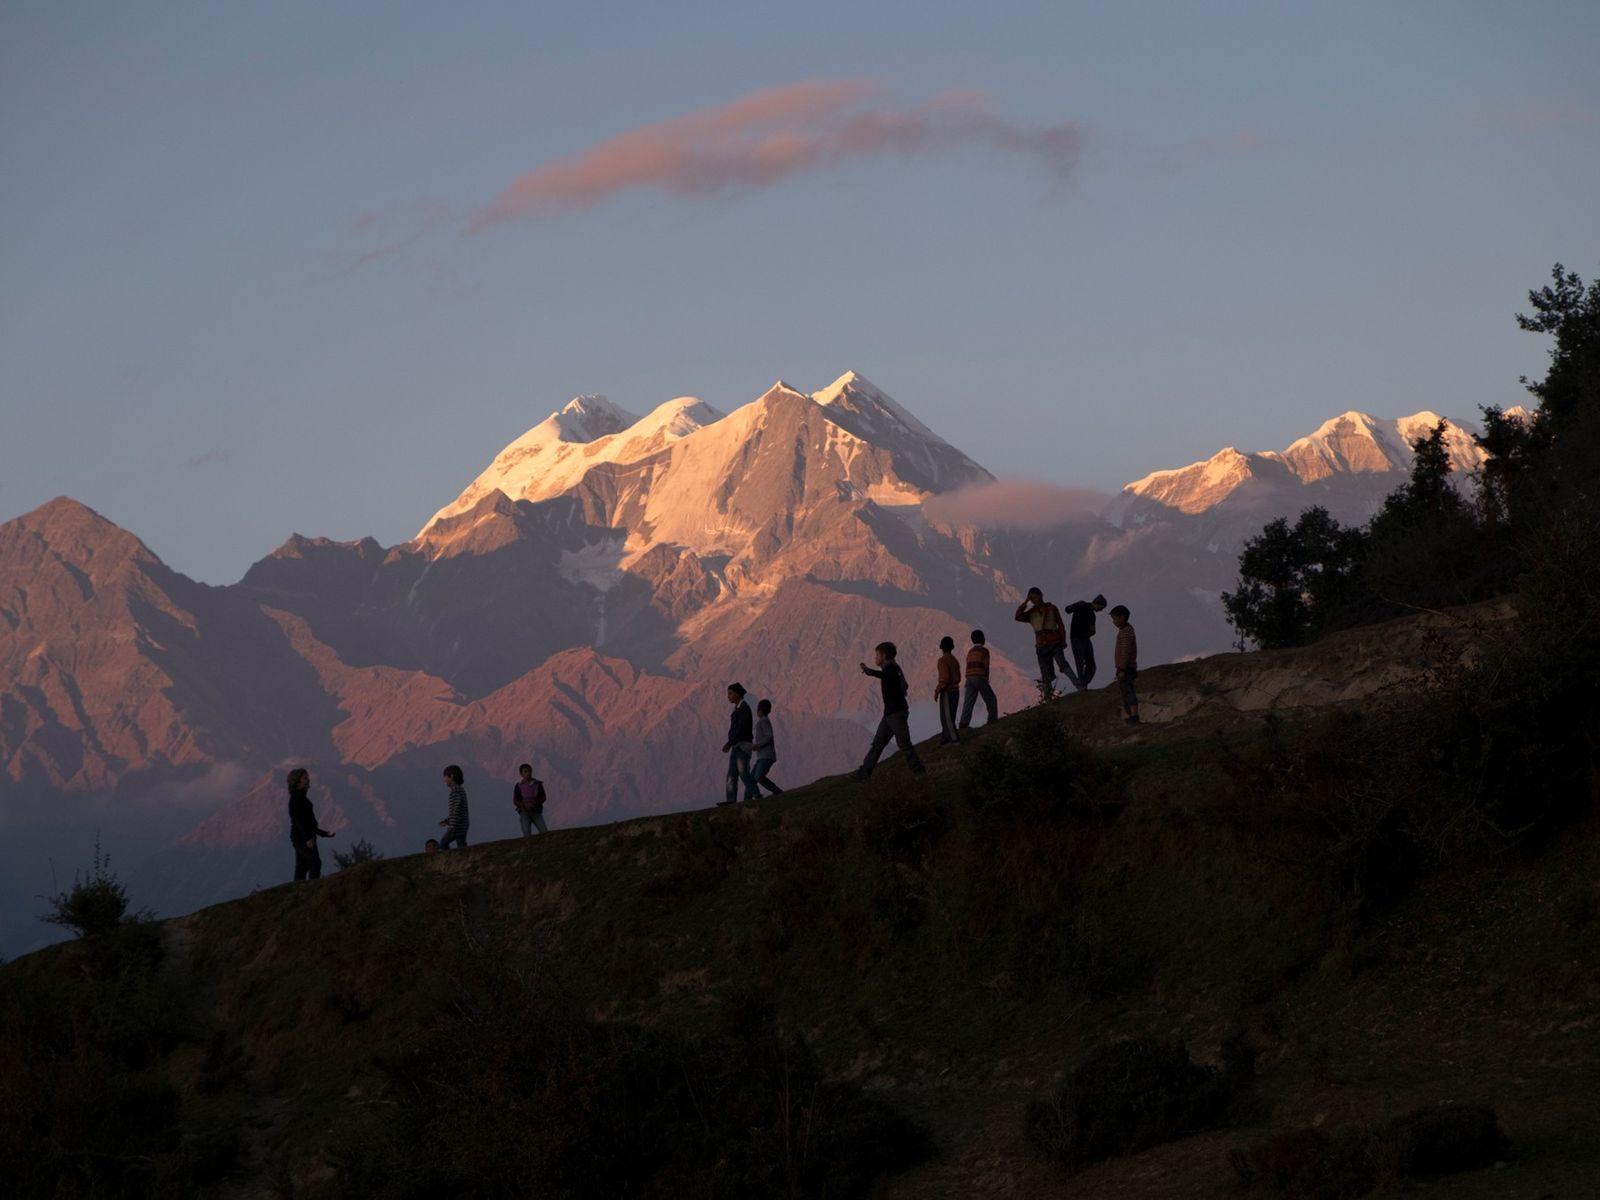 Children play soccer on a slope against a backdrop of the sunlit peaks of Nanda Devi, ...